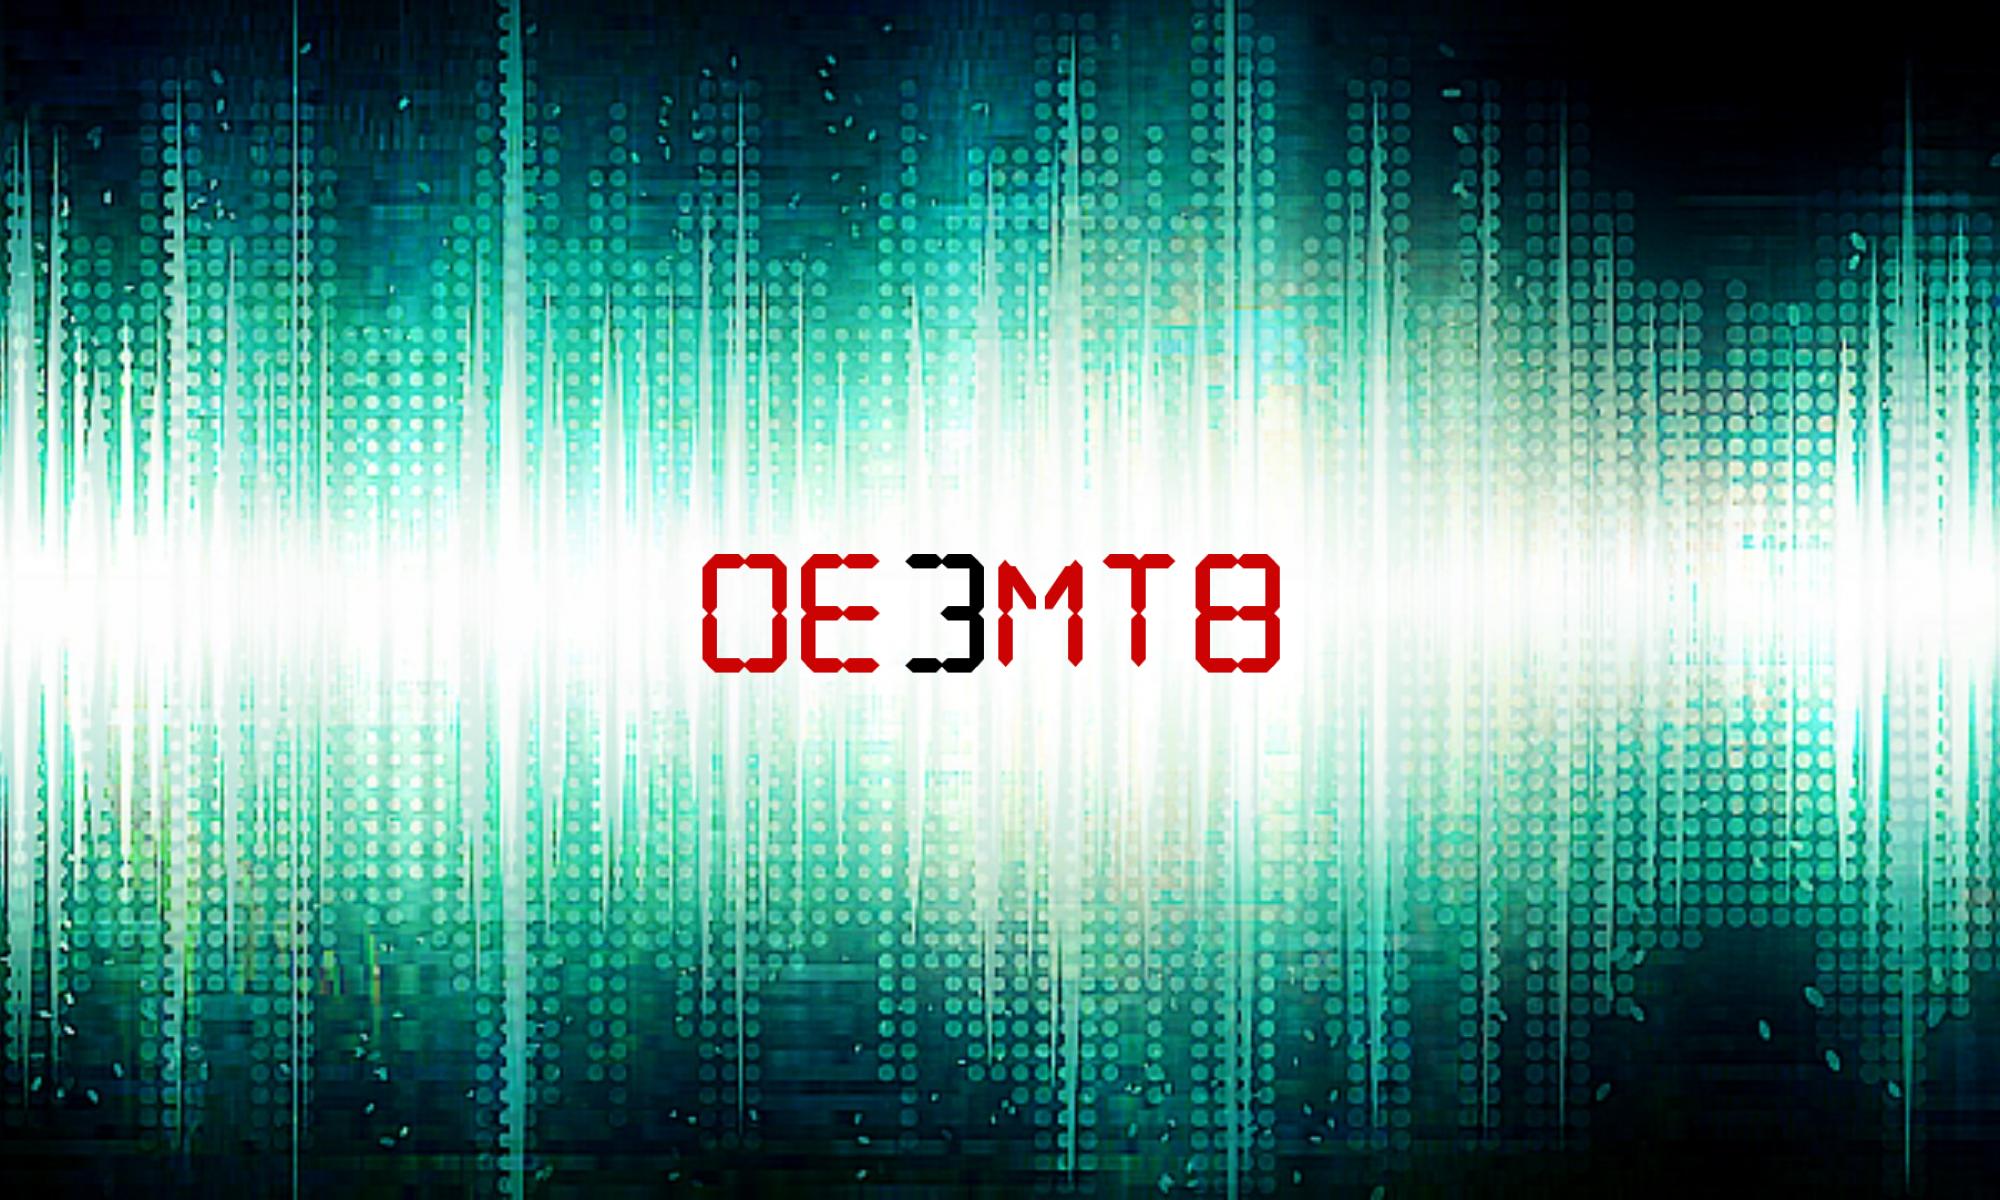 OE3MTB